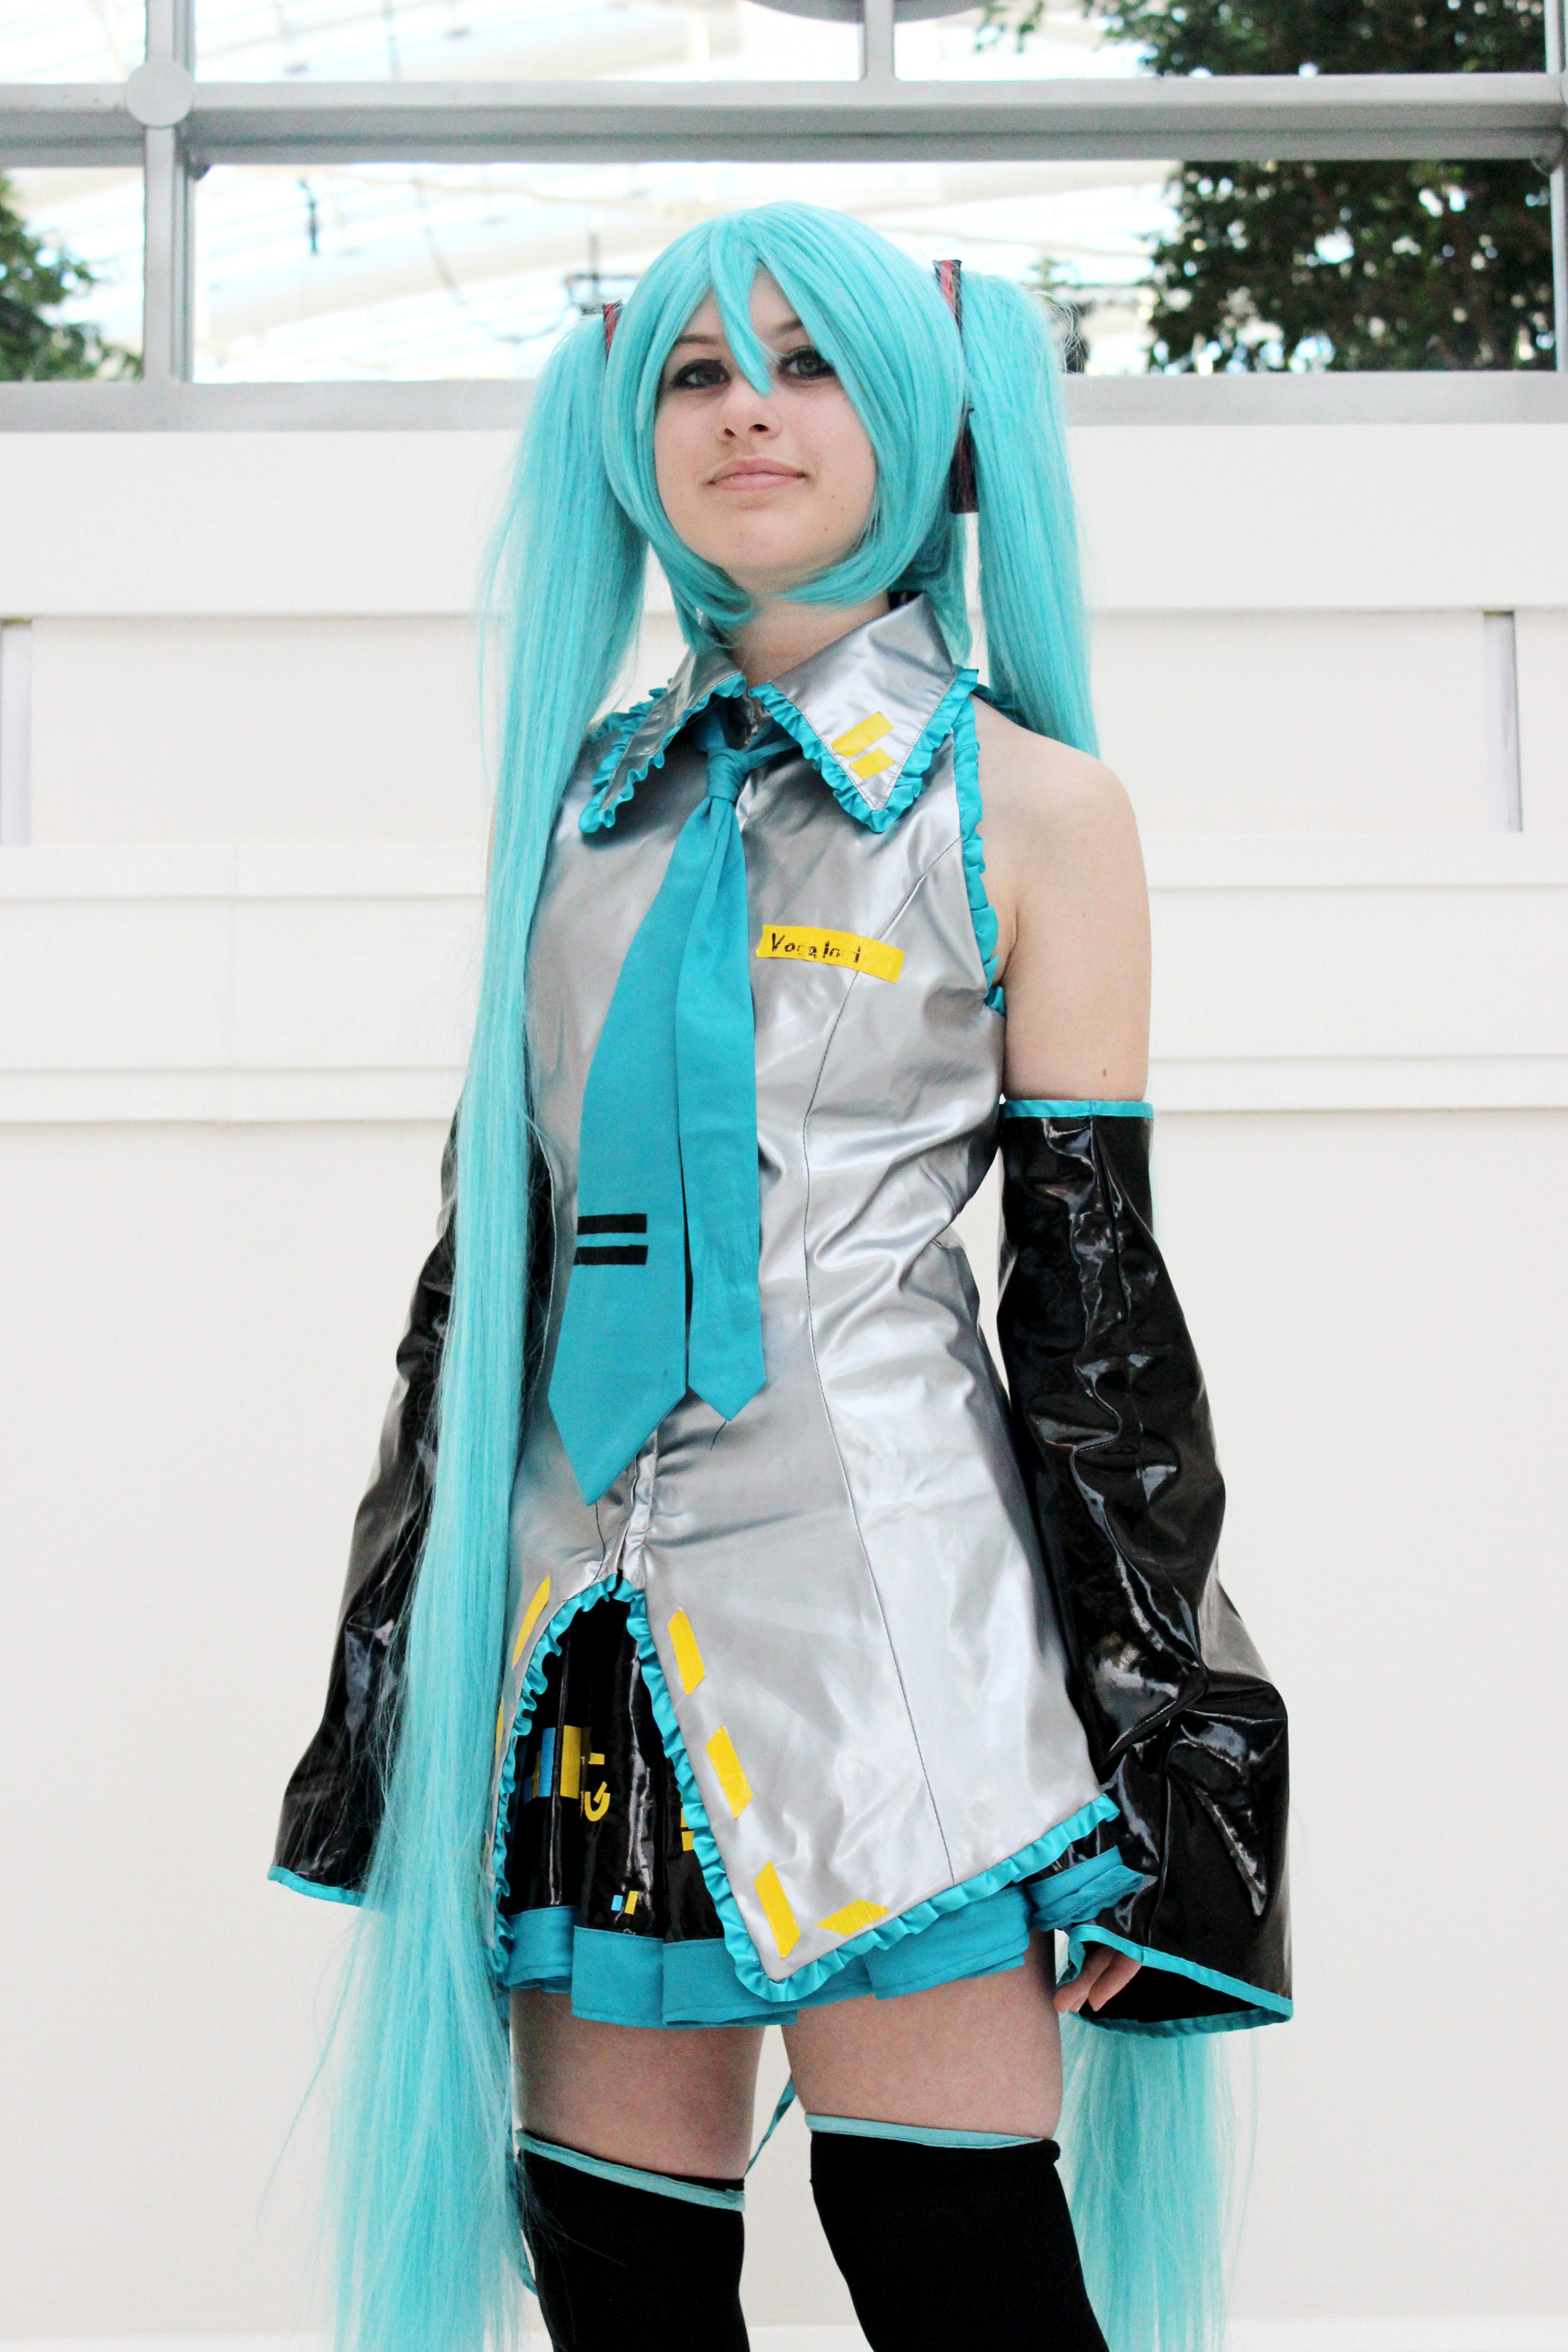 hatsune miku cosplay - photo #28